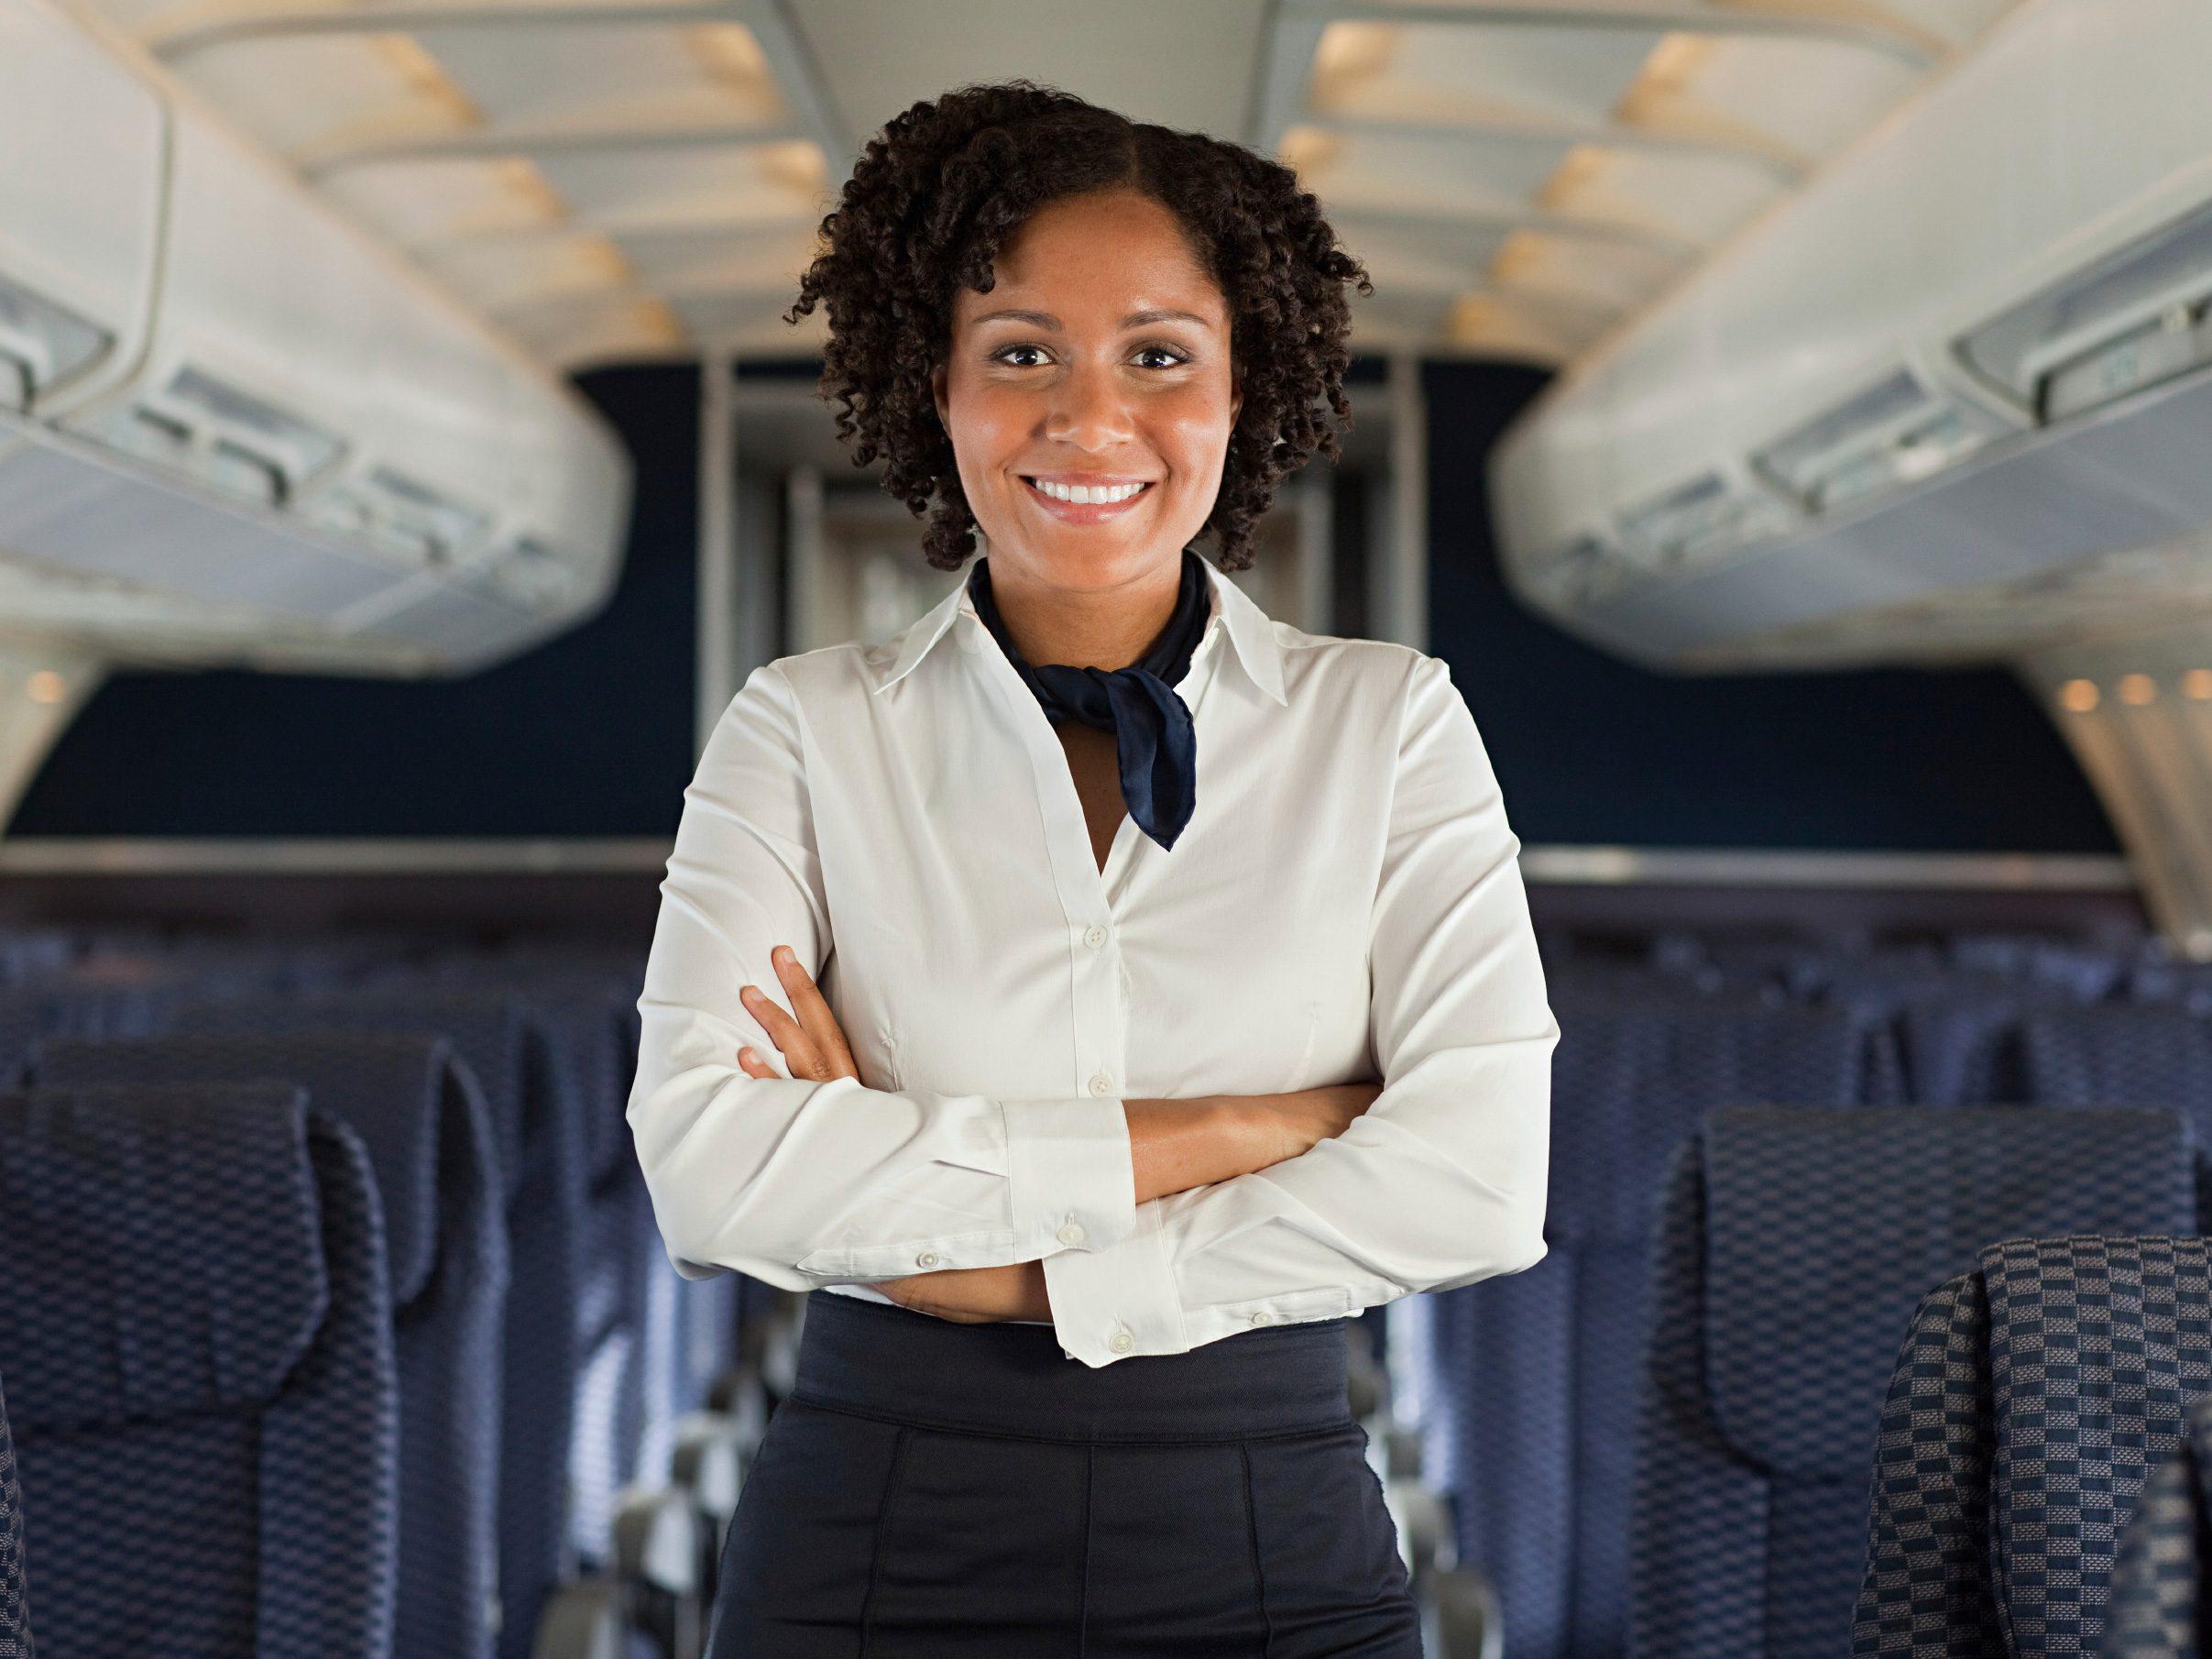 Inform the Flight Attendants